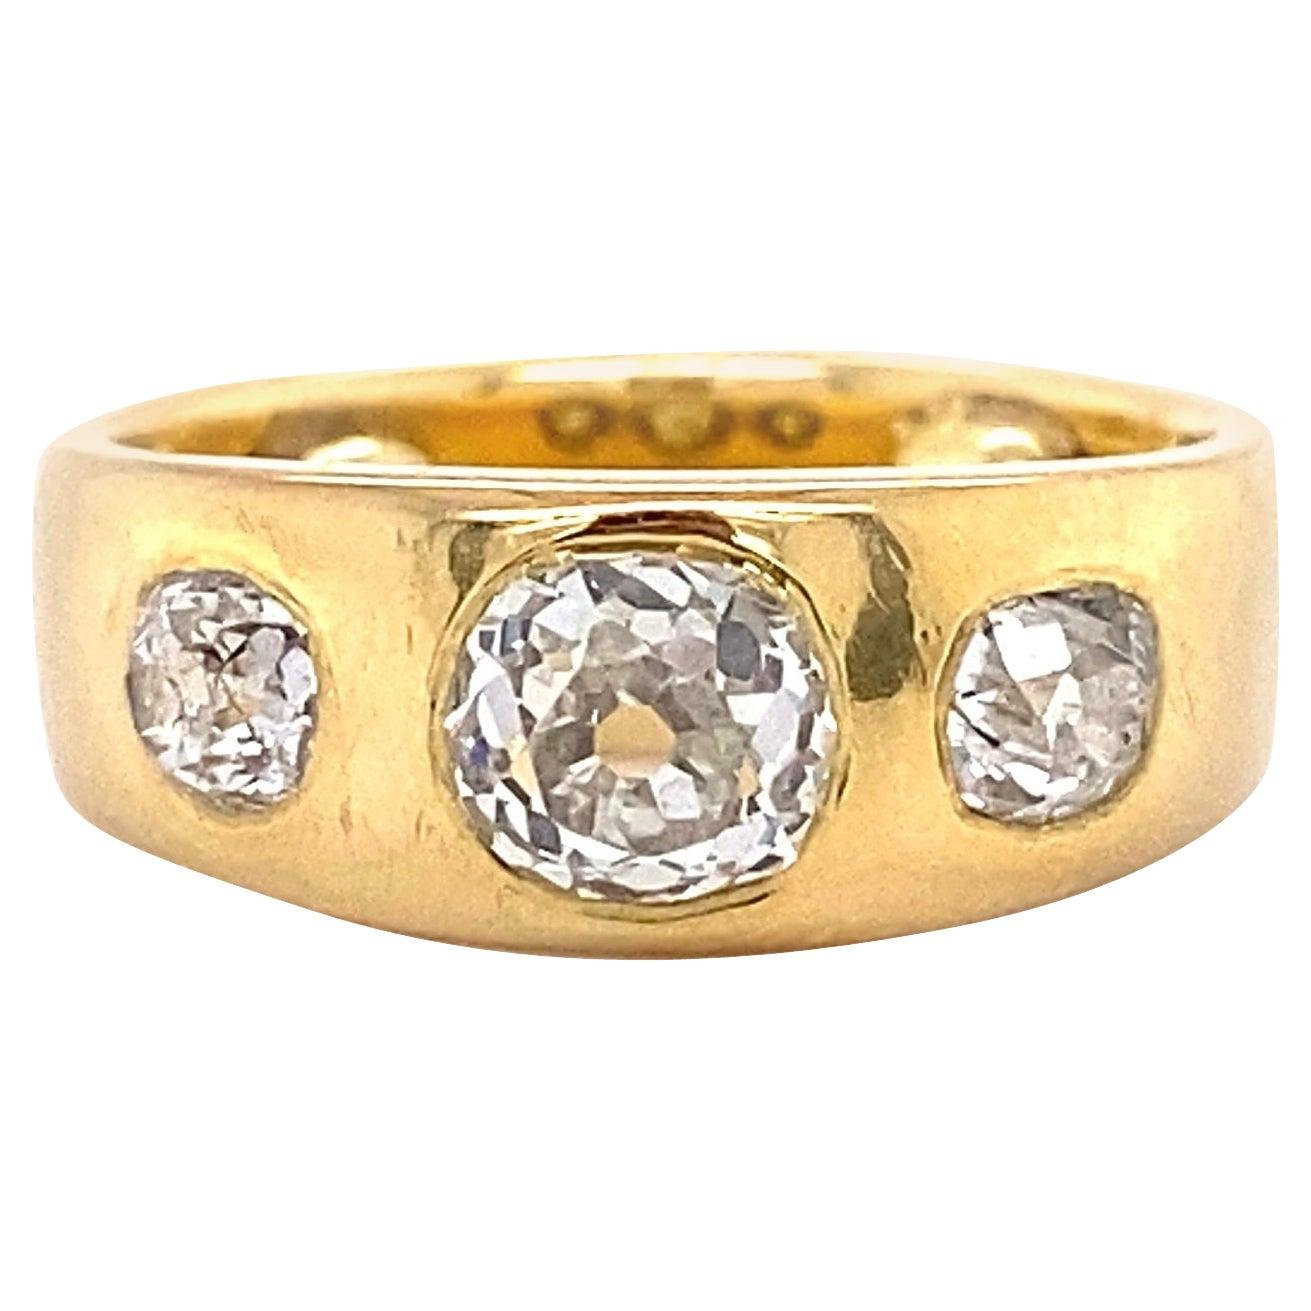 Victorian 3-Stone Old Mine Diamond Gold Ring Estate Fine Jewelry